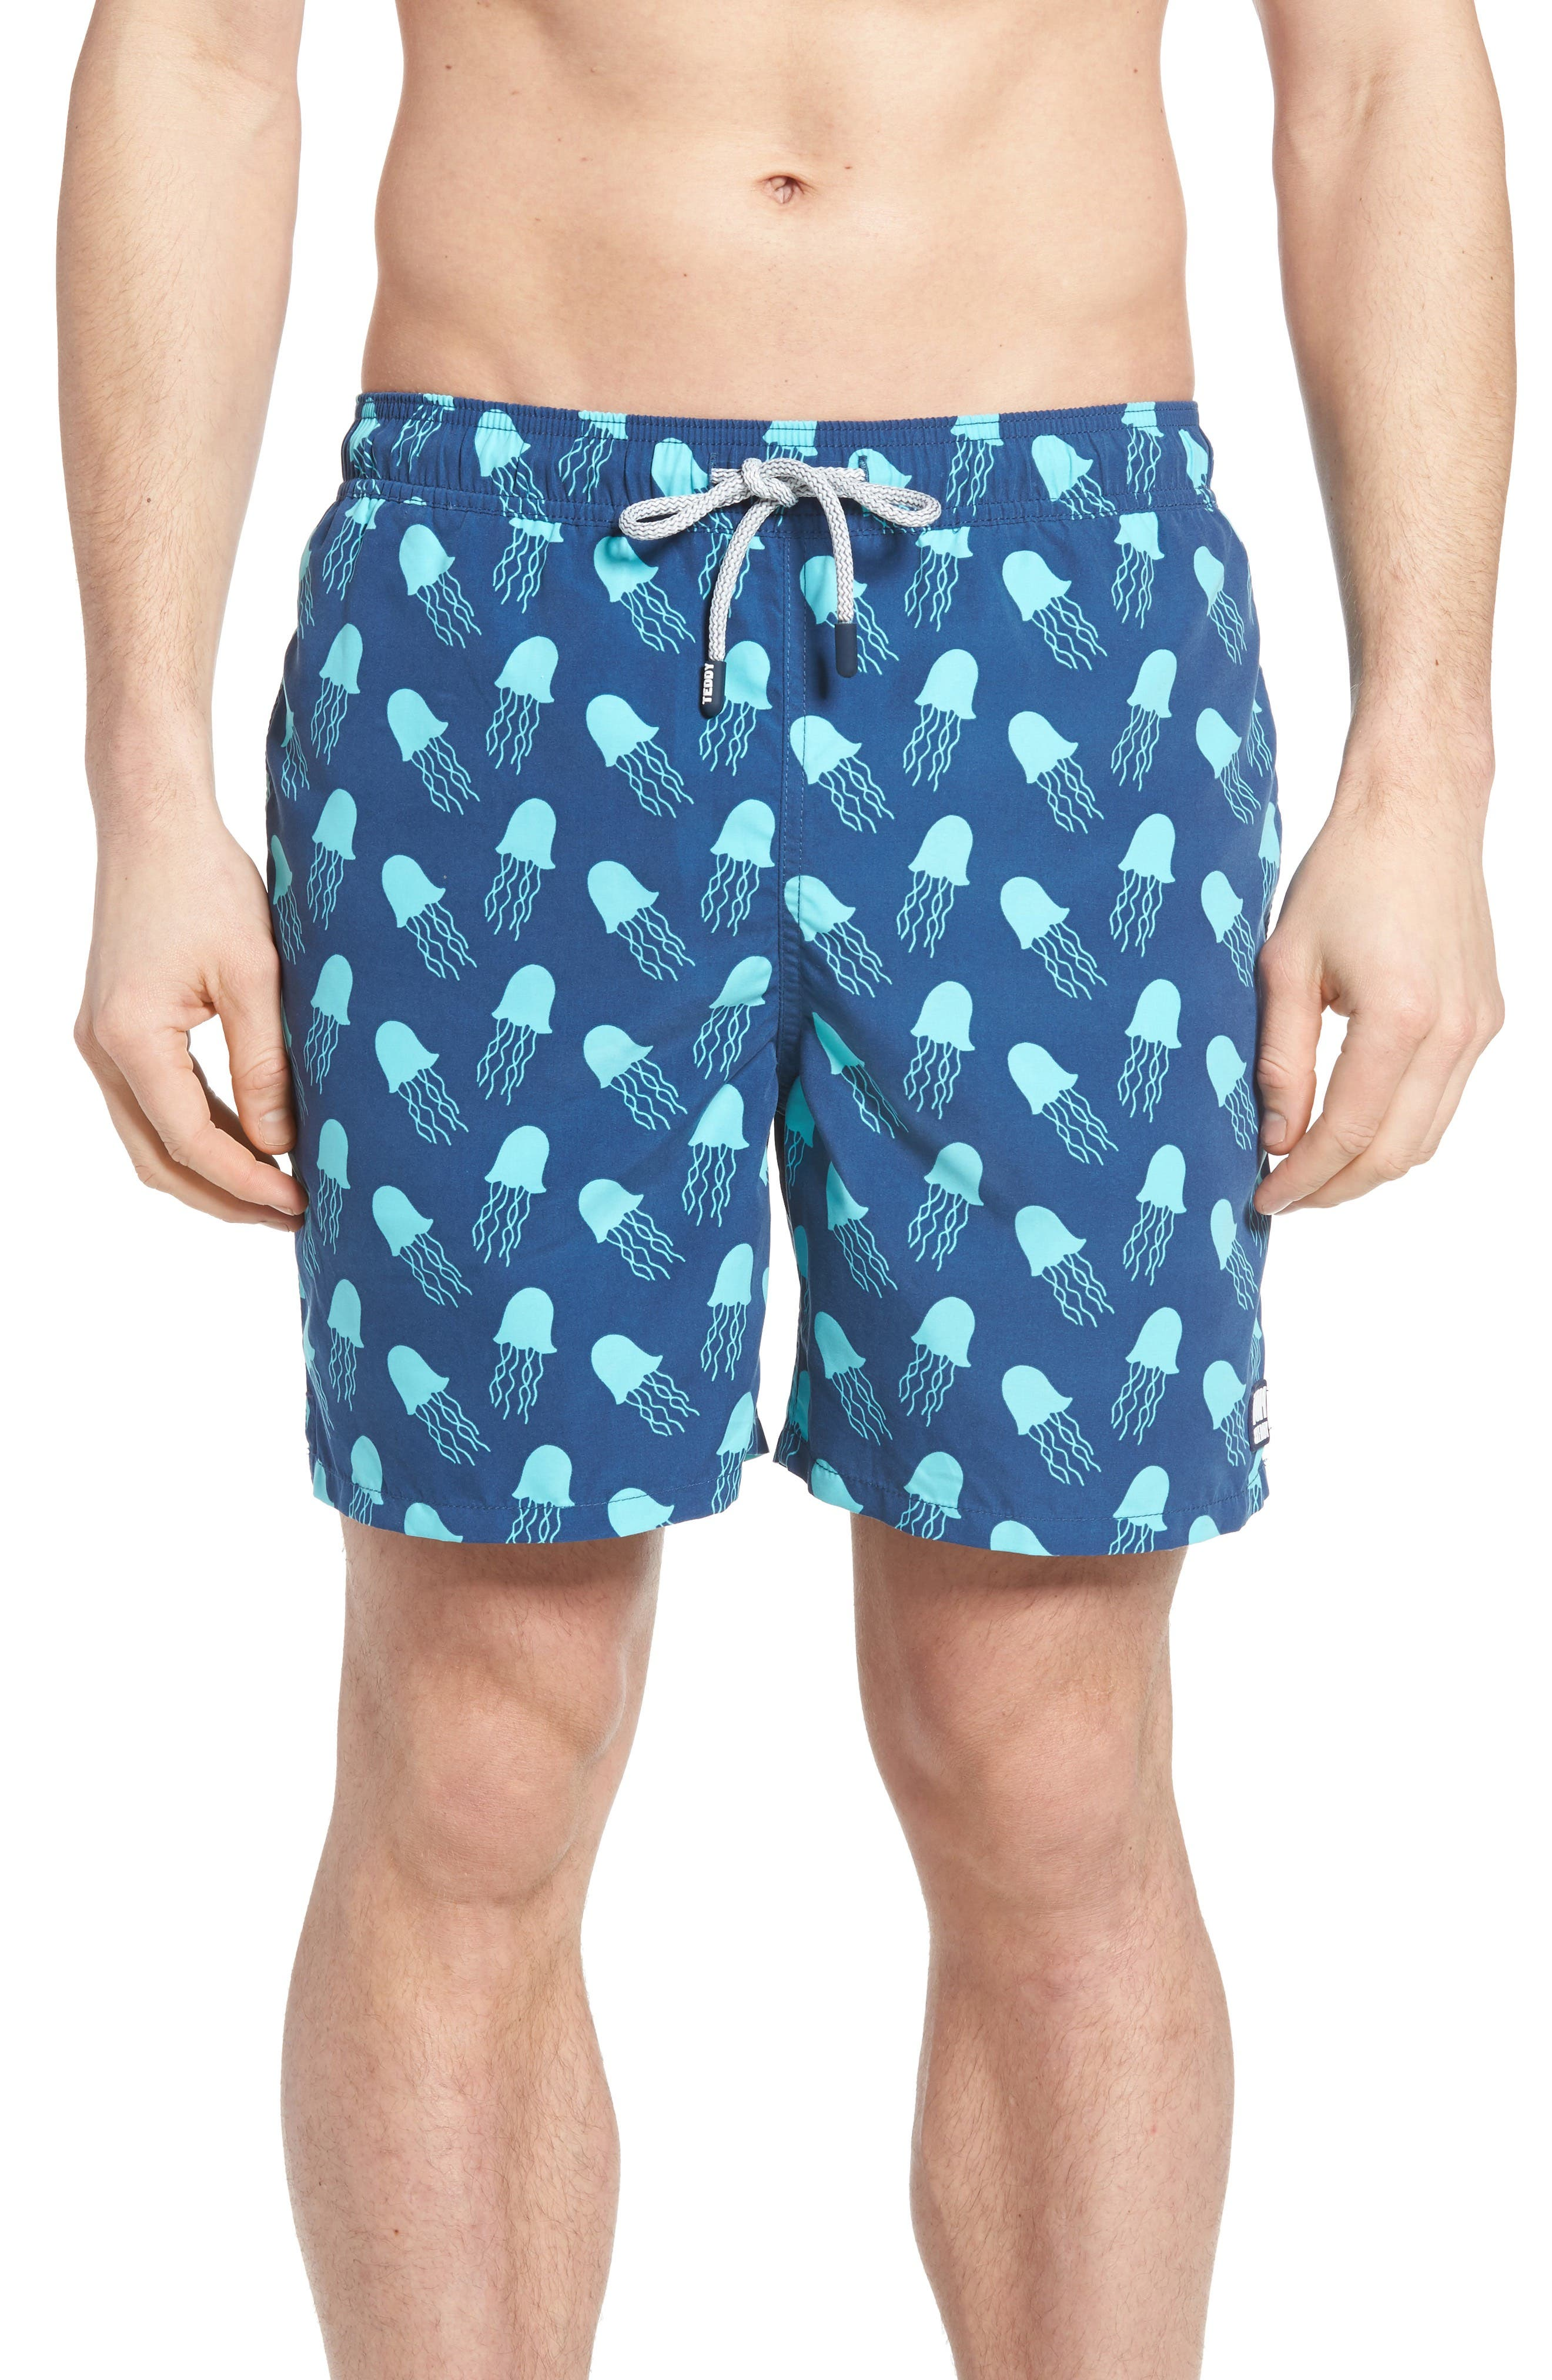 TOM & TEDDY Jellyfish Print Swim Trunks in Navy Turquoise